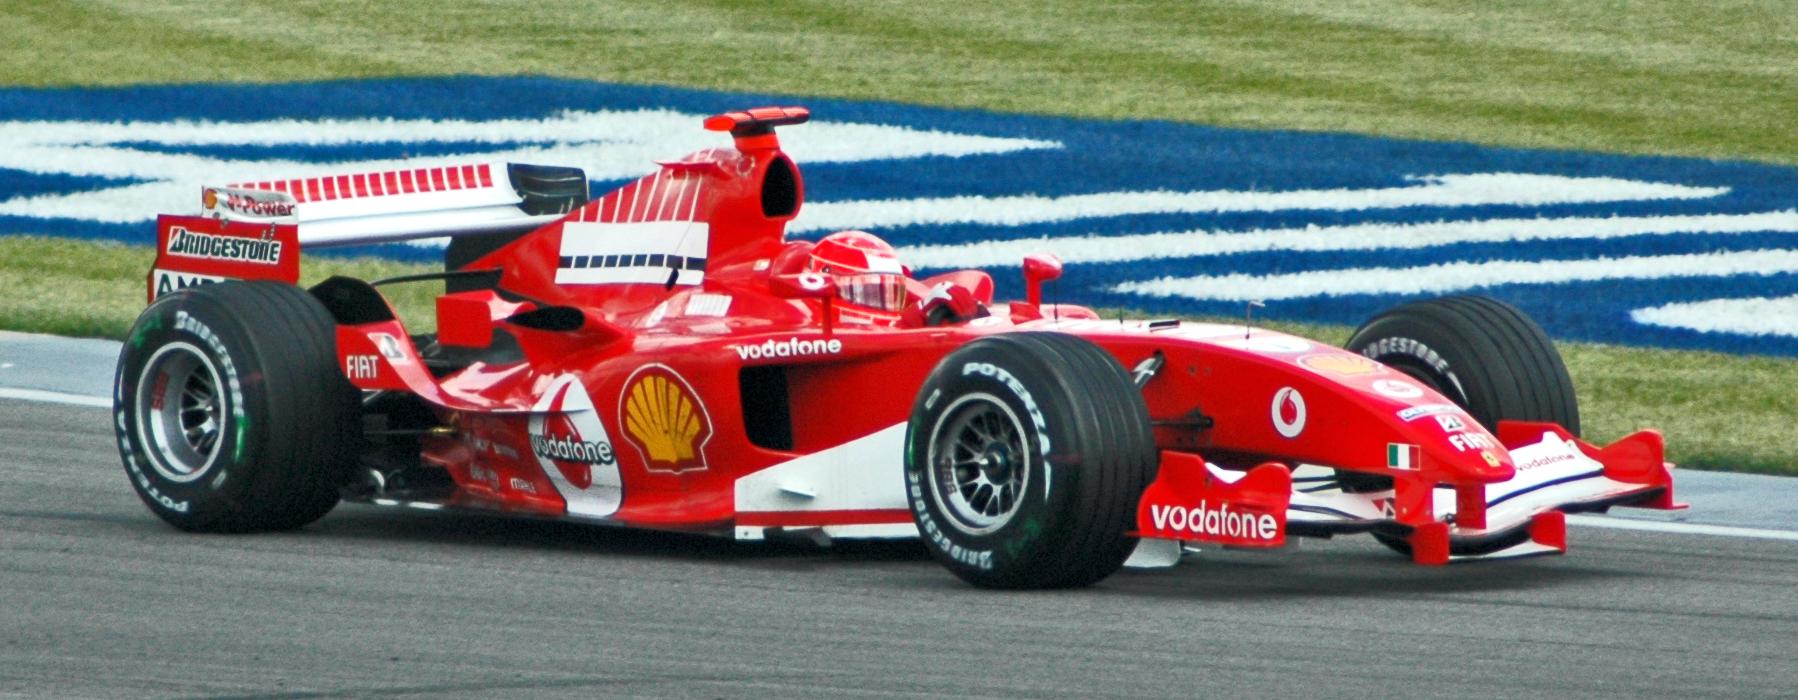 Datei Schumacher Ferrari In Practice At Usgp 2005 Jpg Wikipedia